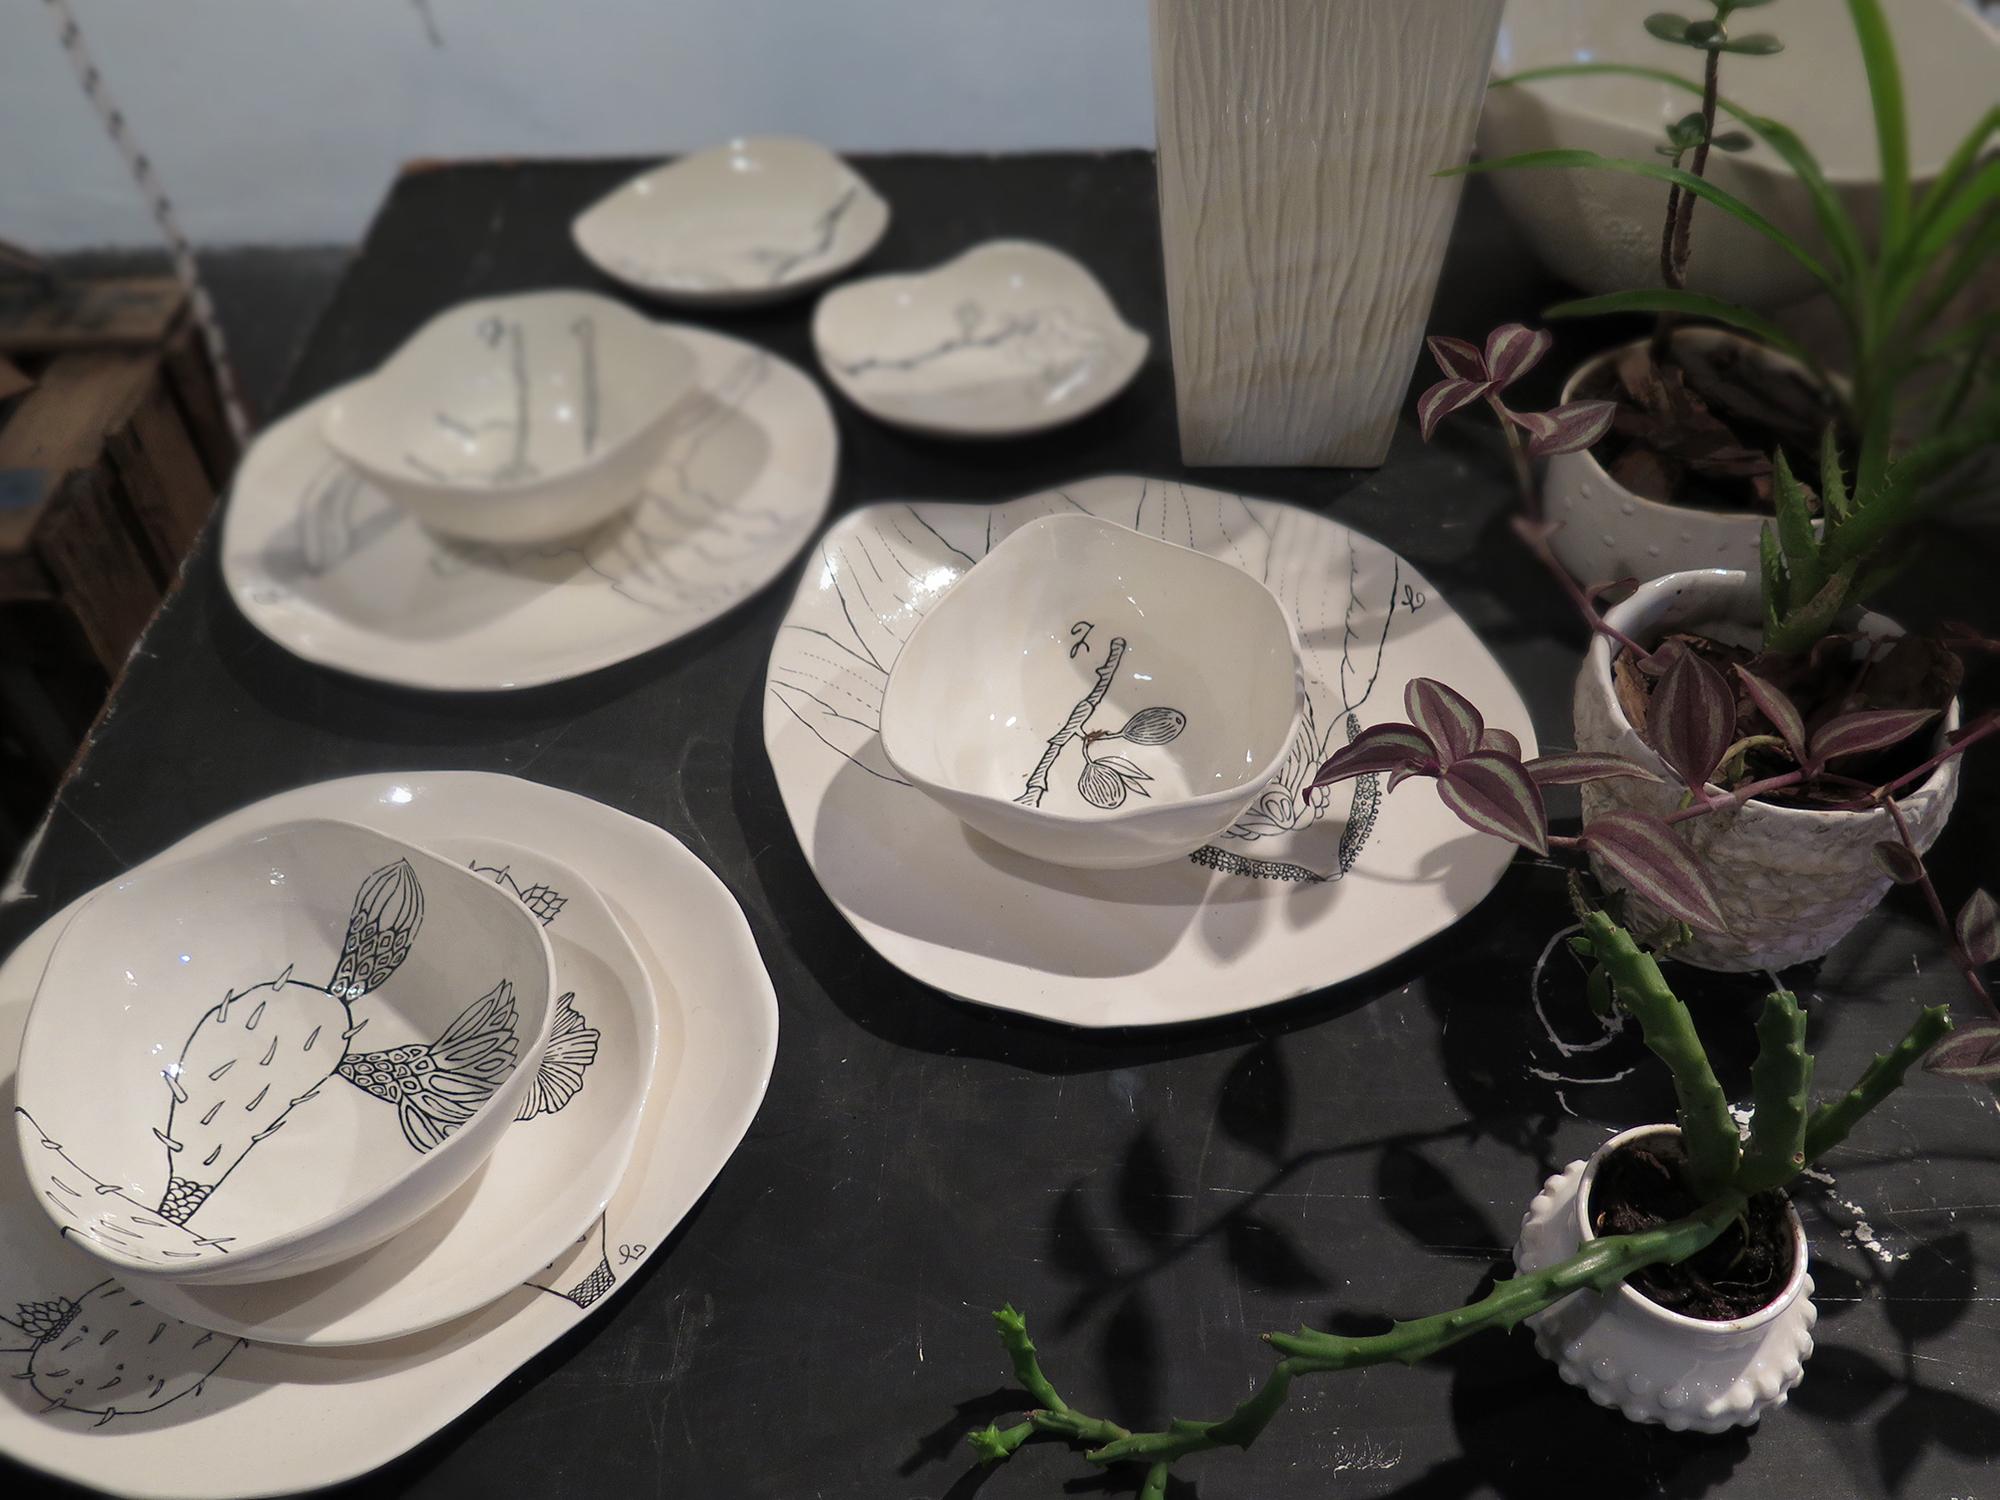 Porcelanas de Nicole Toldi